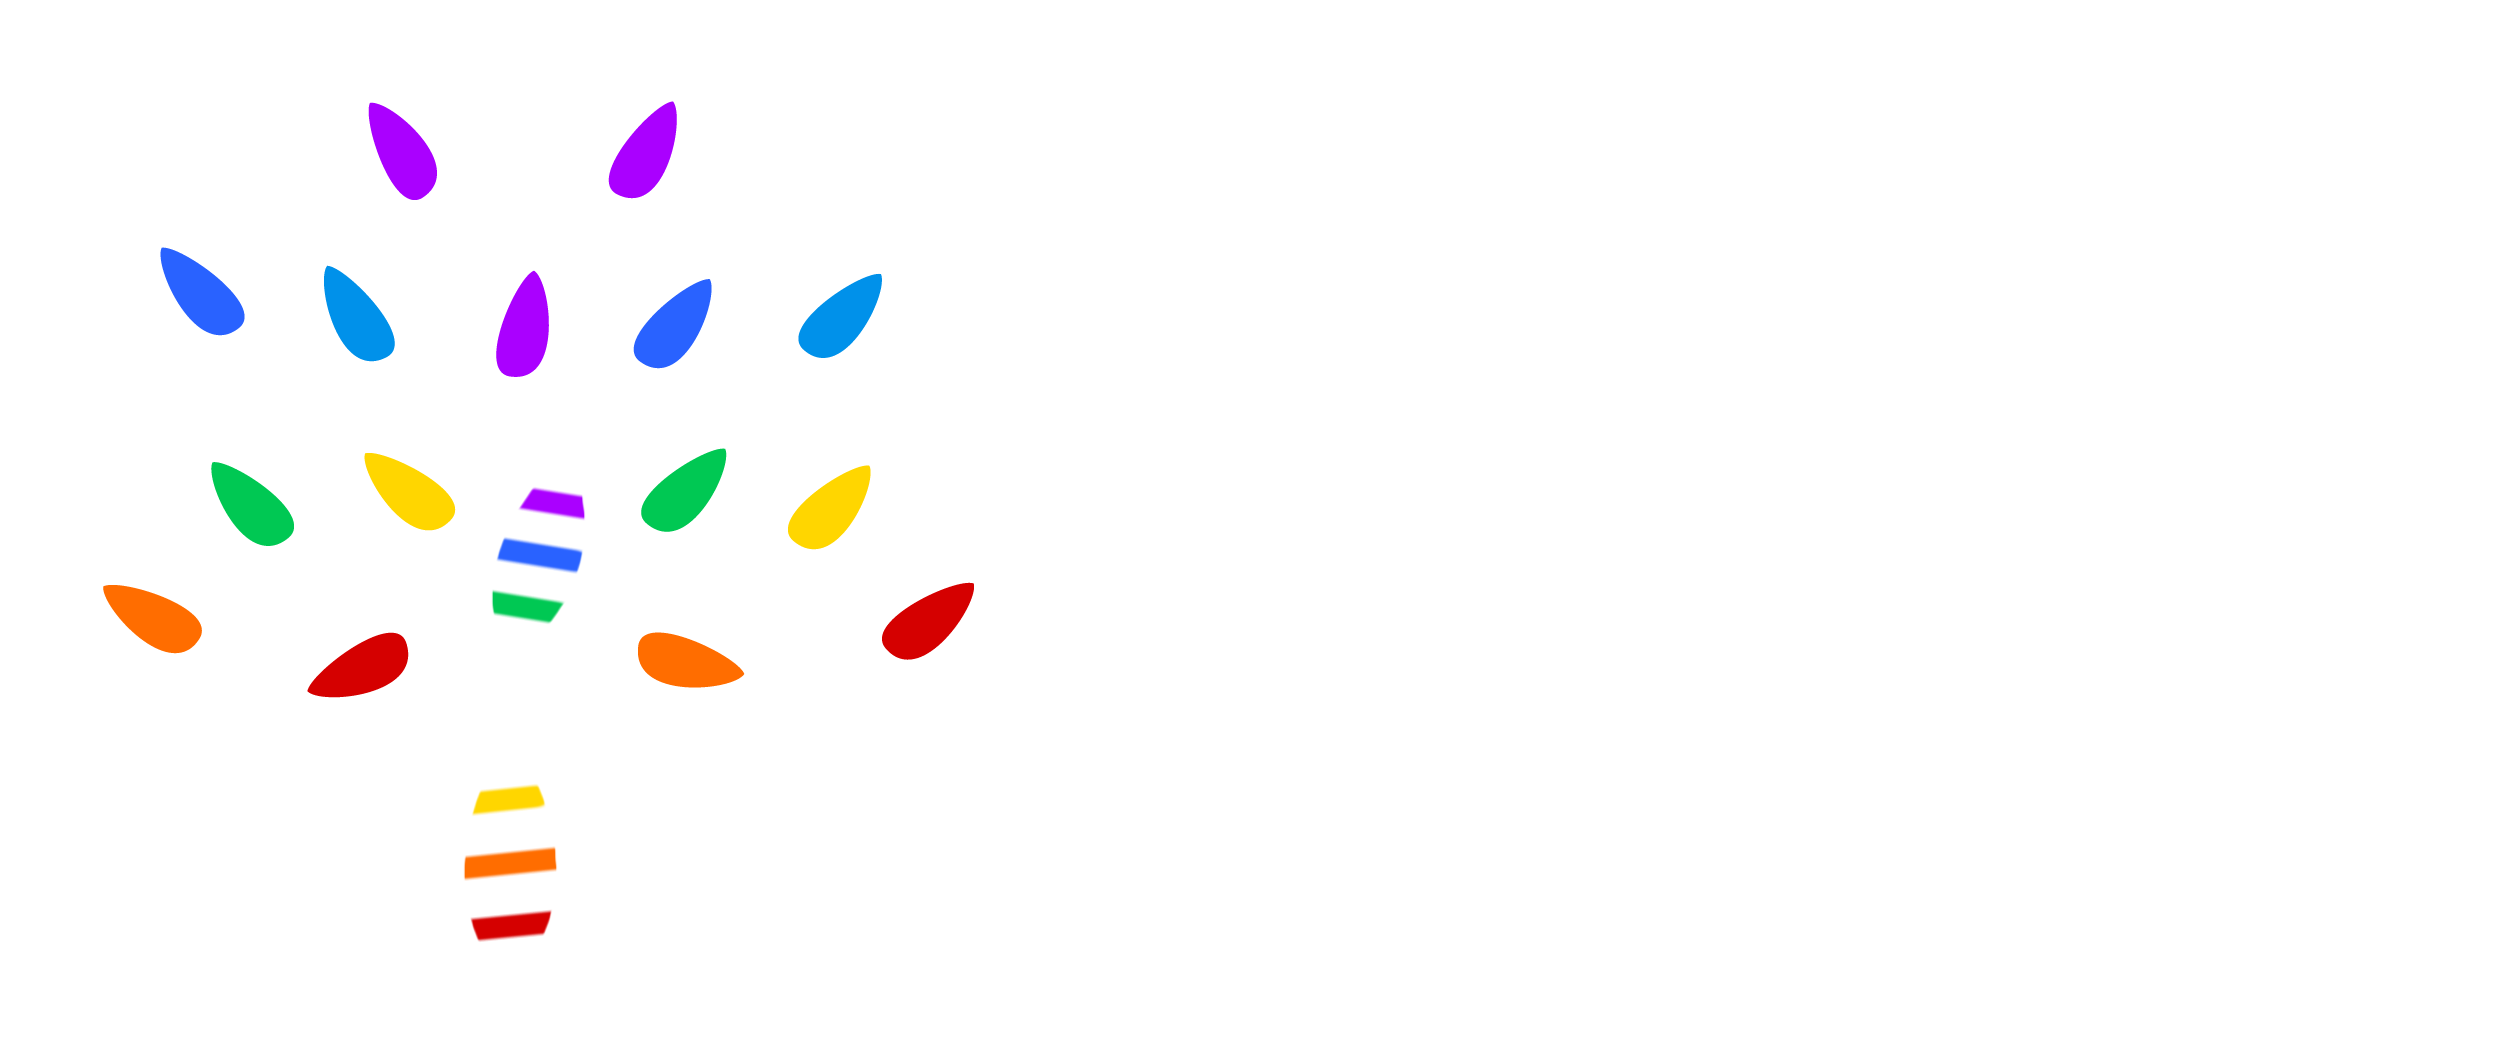 mutlu-yasam-akademisi-logo